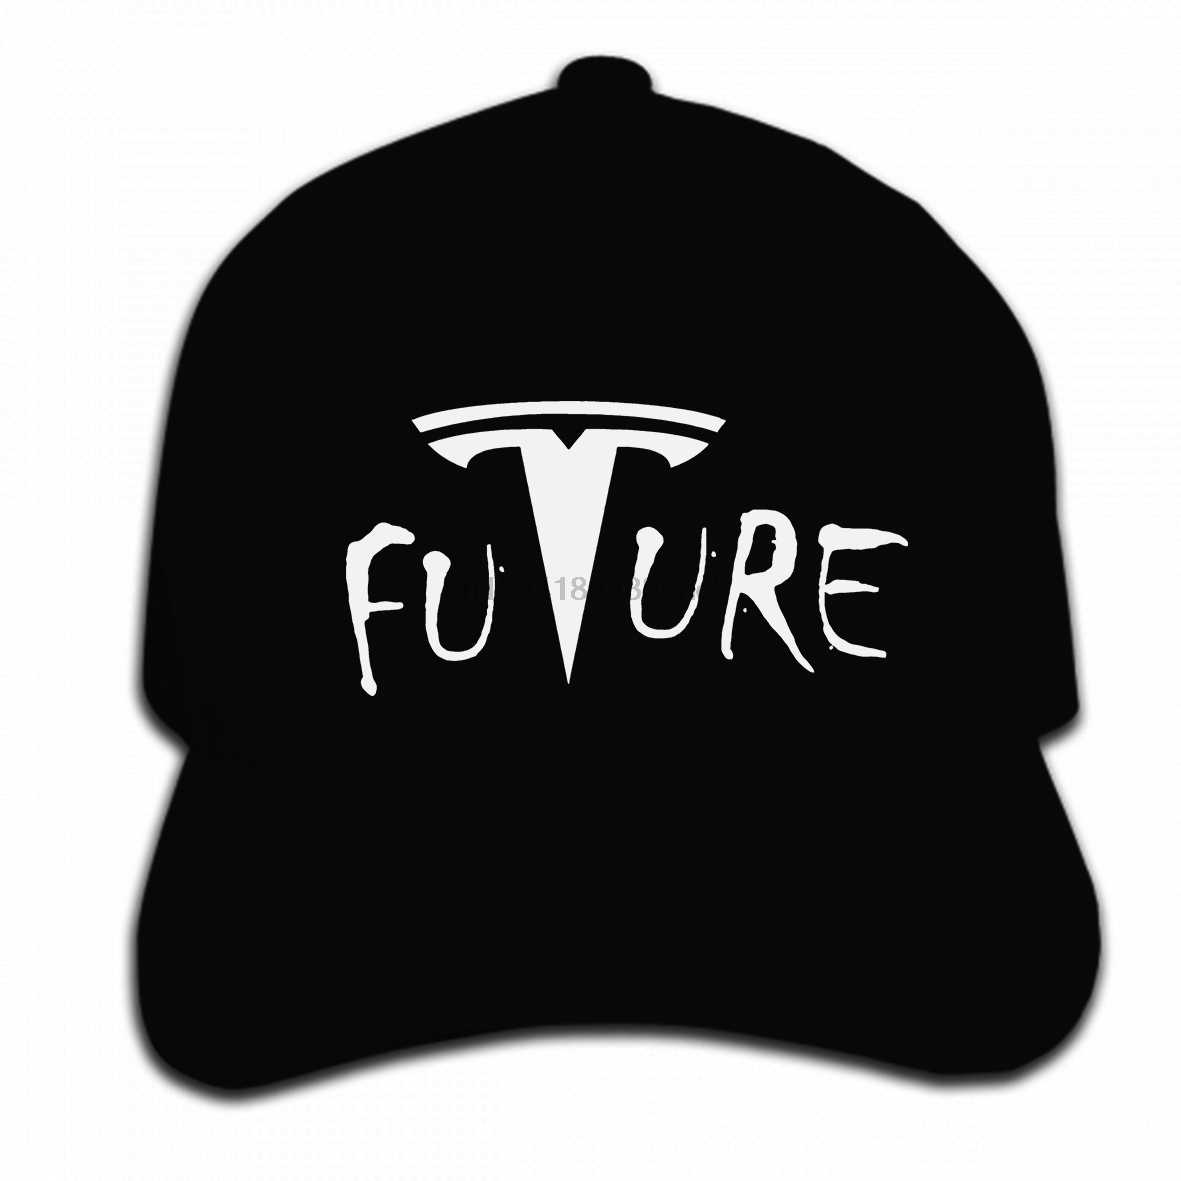 58696d87 Print Custom Baseball Cap Hip Hop Tesla motors is Future Cars Elon Musk  ized Hat Peaked